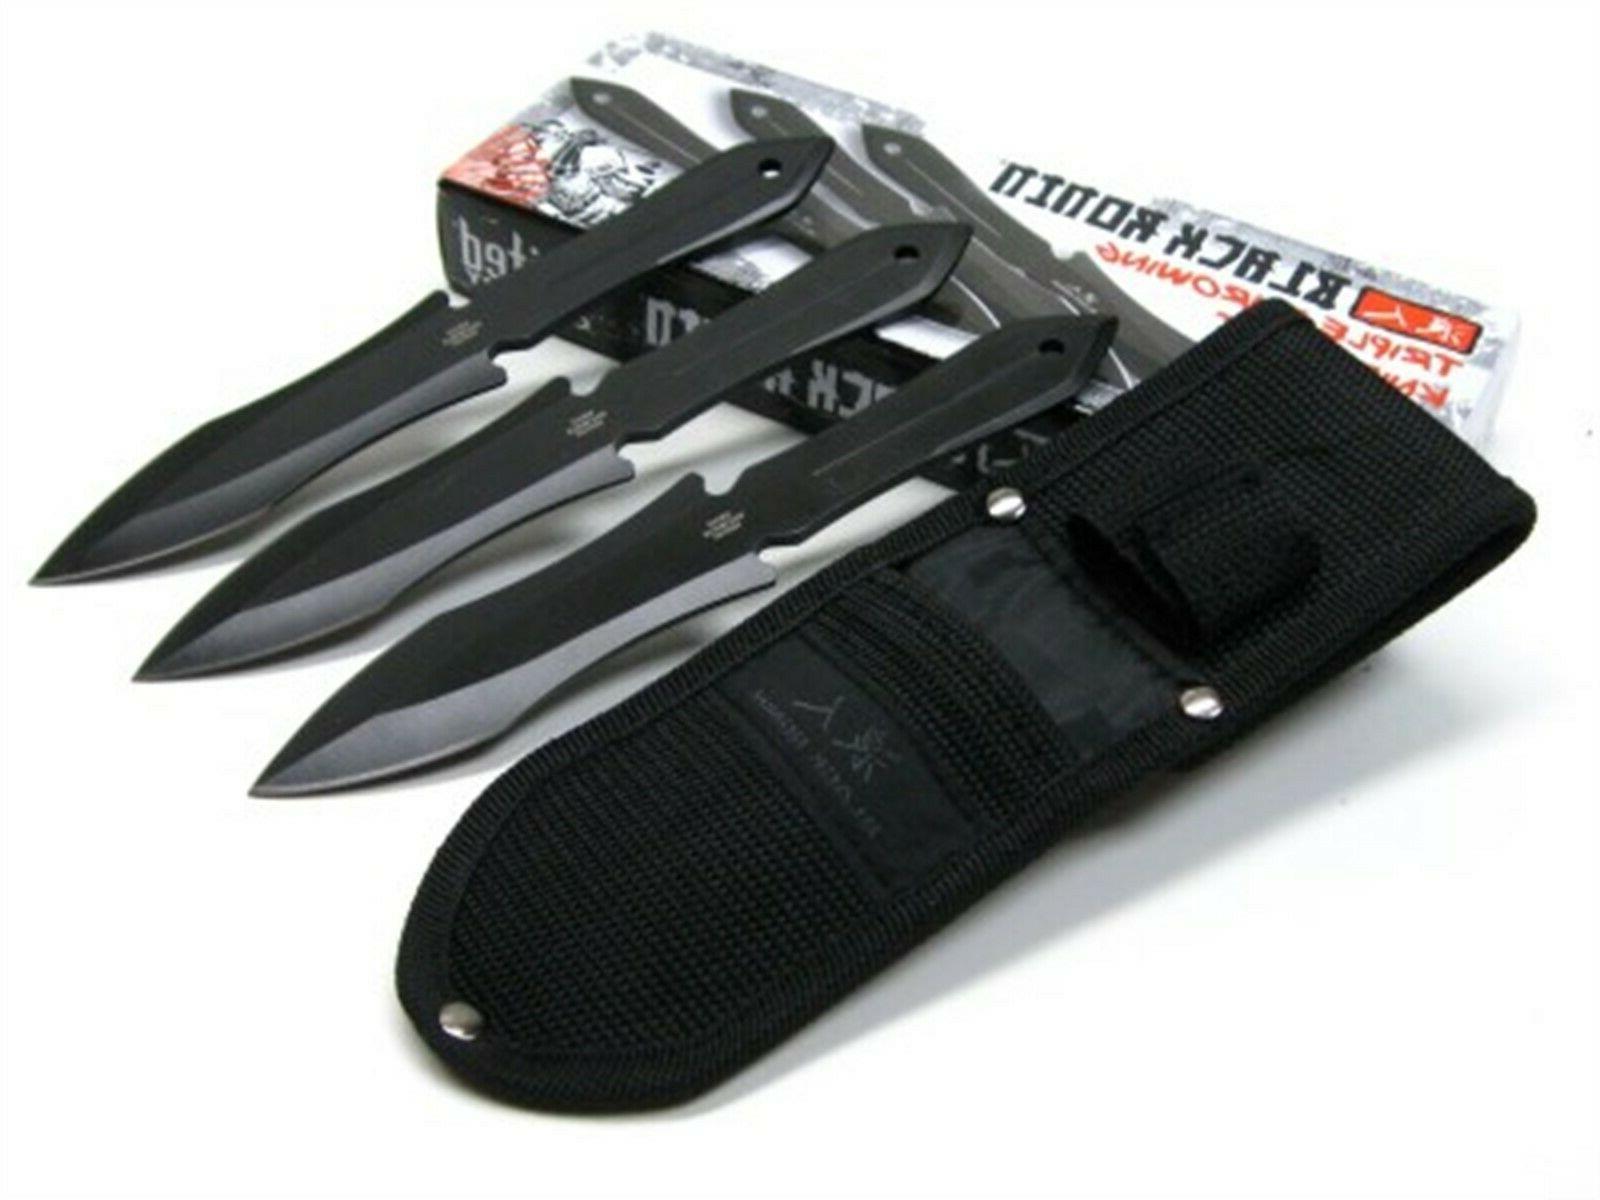 United UC3253 Ronin 3Cr13 Throwing Boot Knife Set Sheath